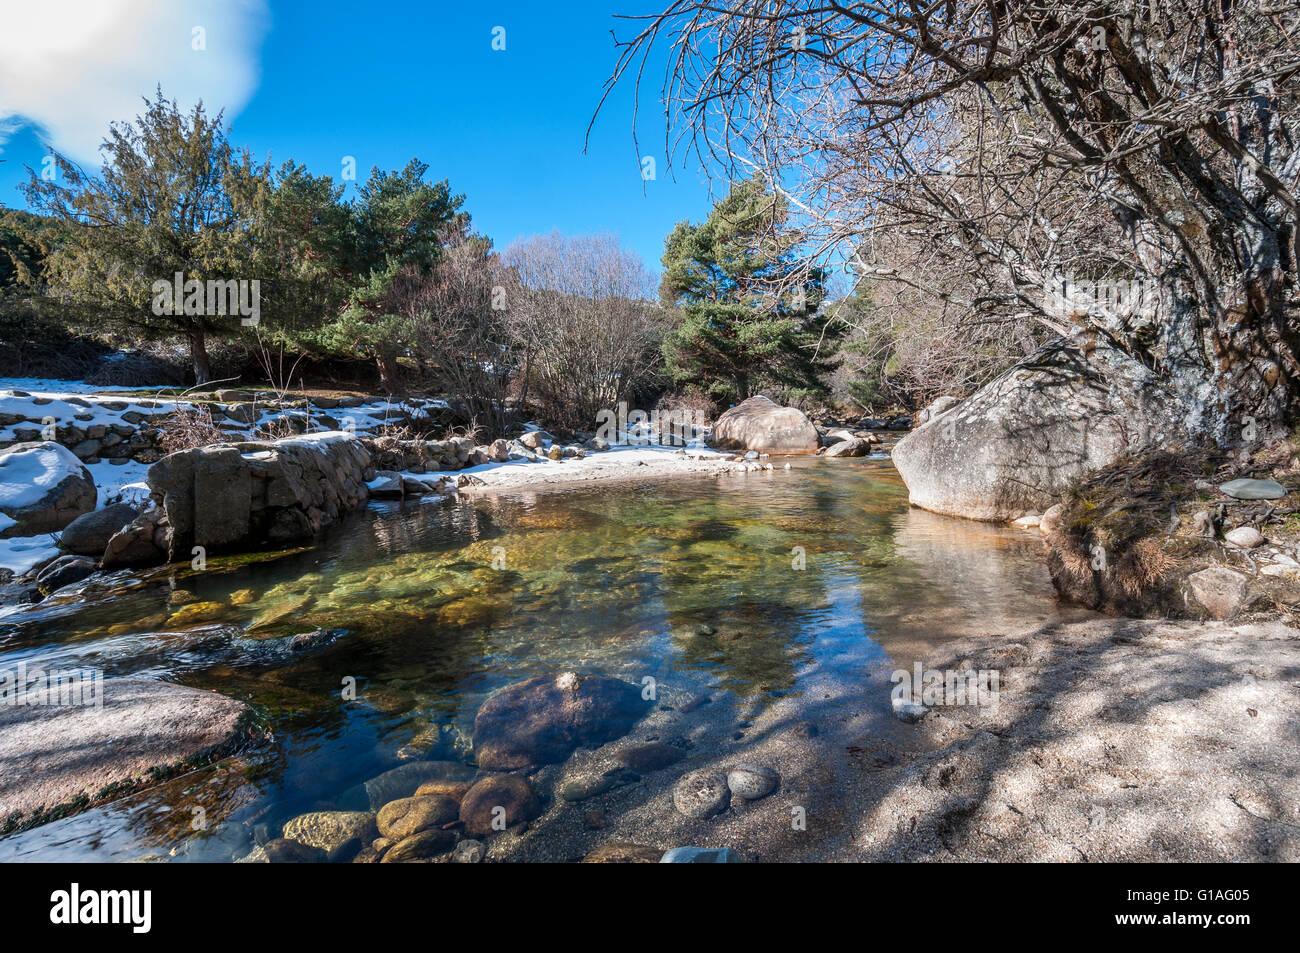 The River Manzanares along its course through La Pedriza, in Guadarrama Mountains National Park, Madrid, Spain Stock Photo